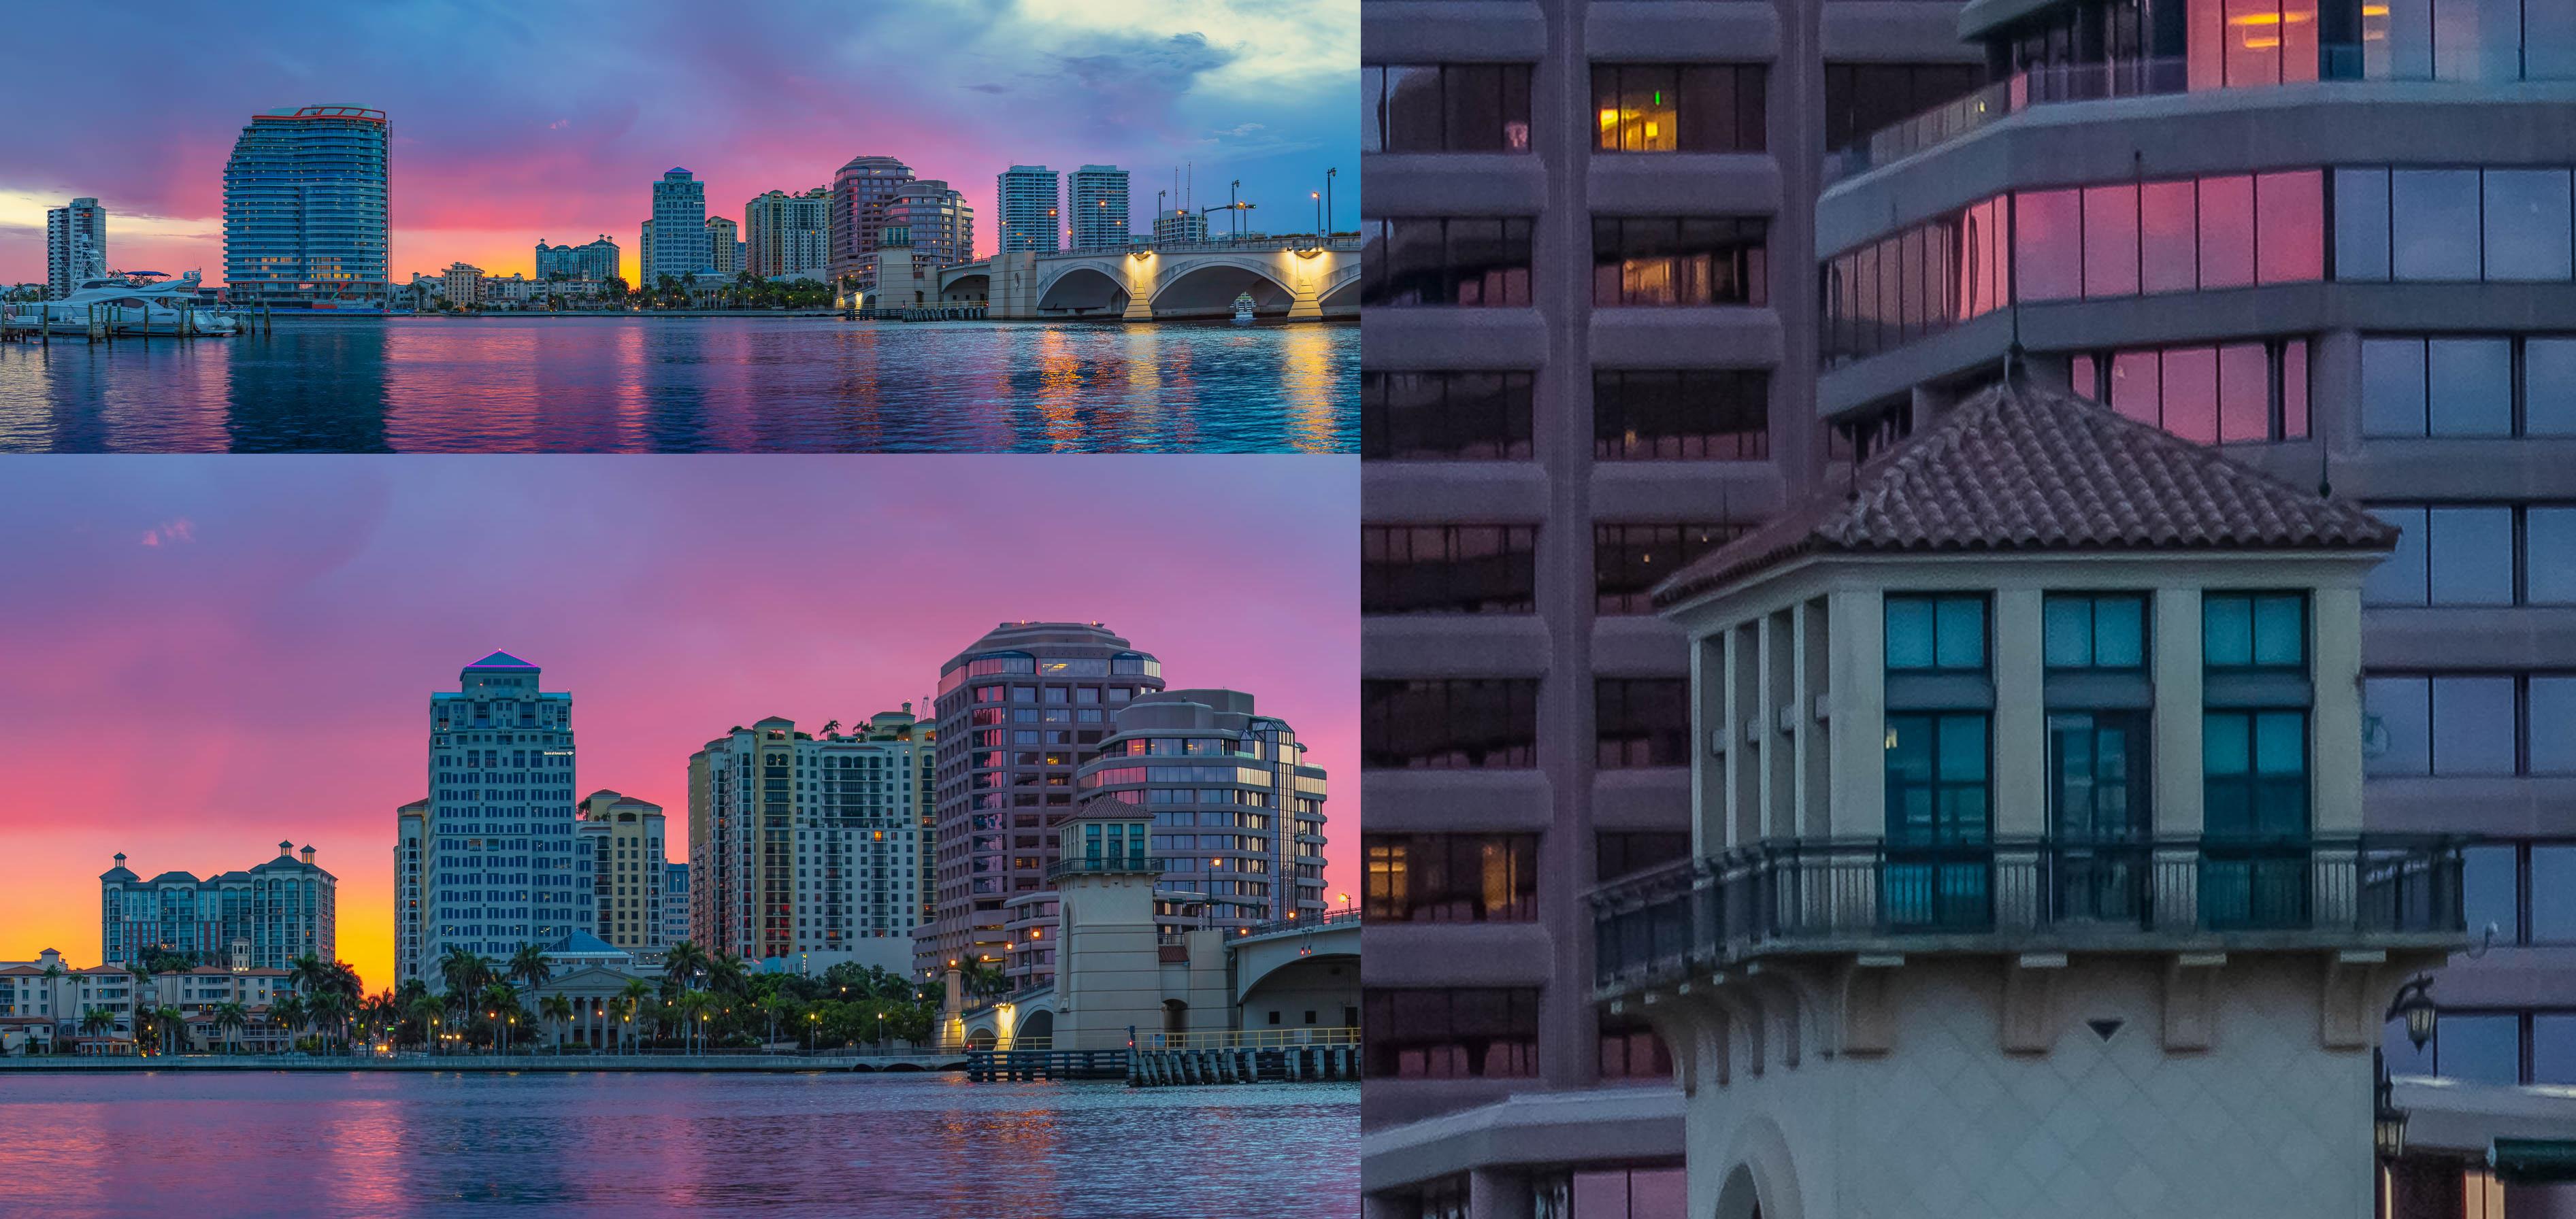 West Palm Beach Gigapan Sunset Waterway